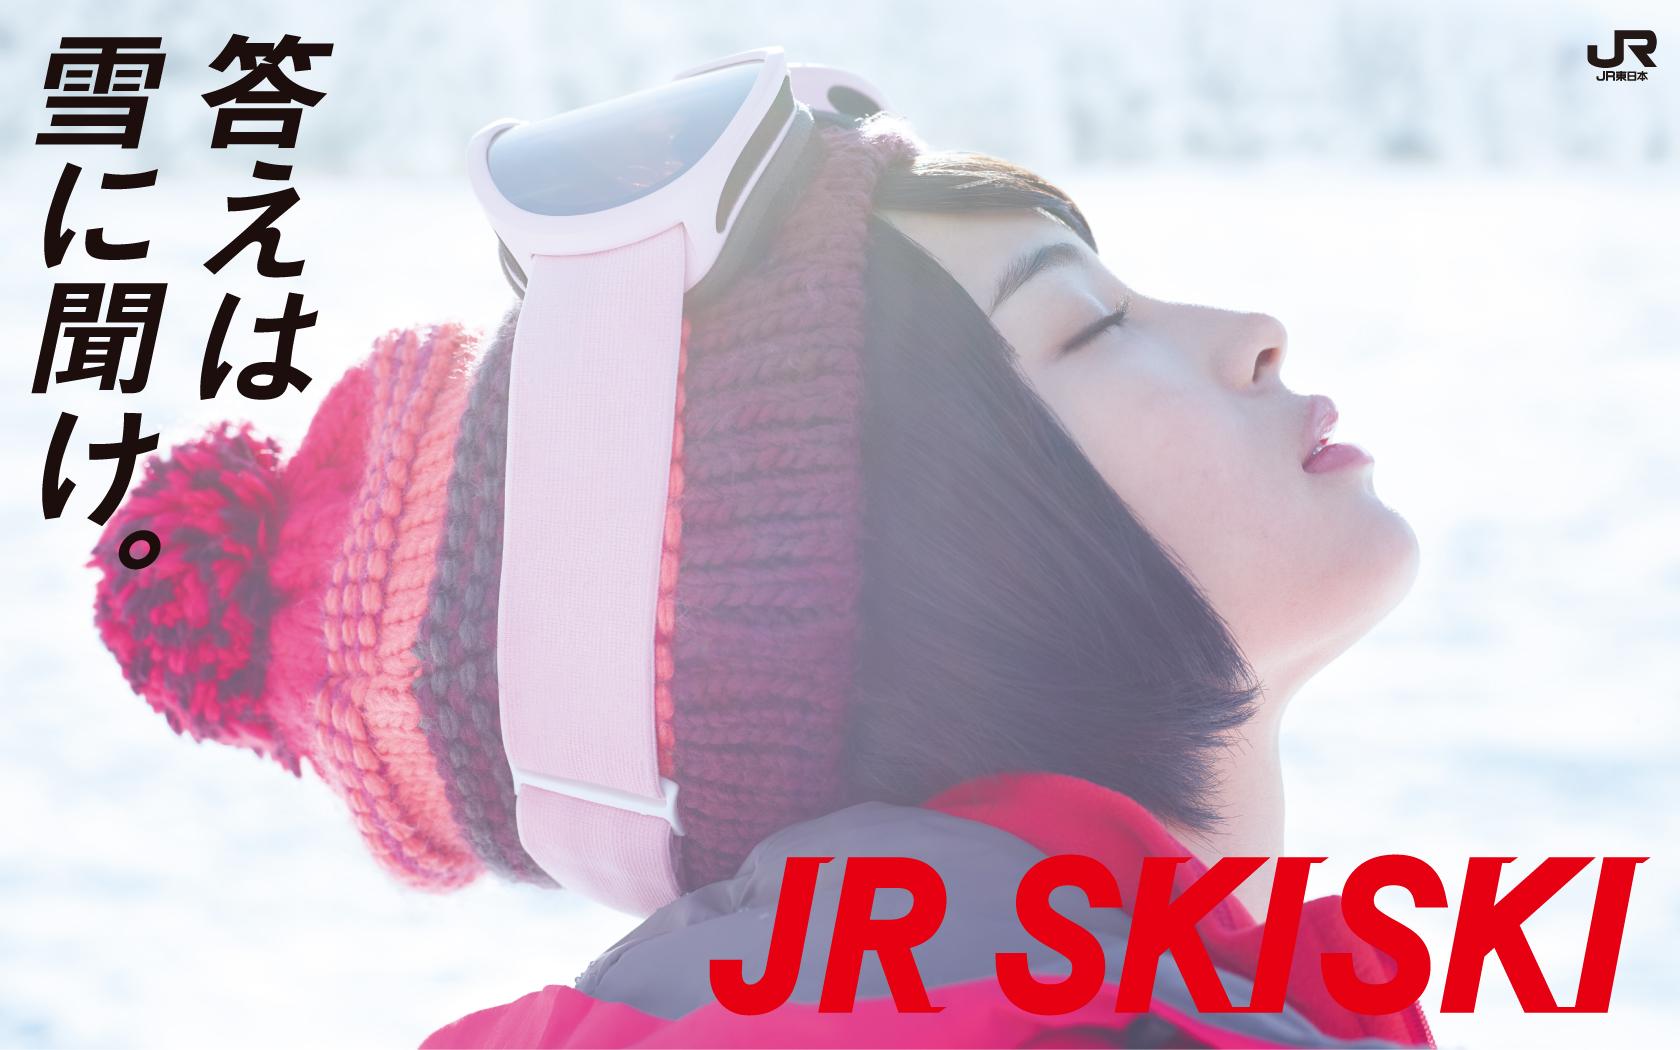 JR SKISKI   suzu hirose